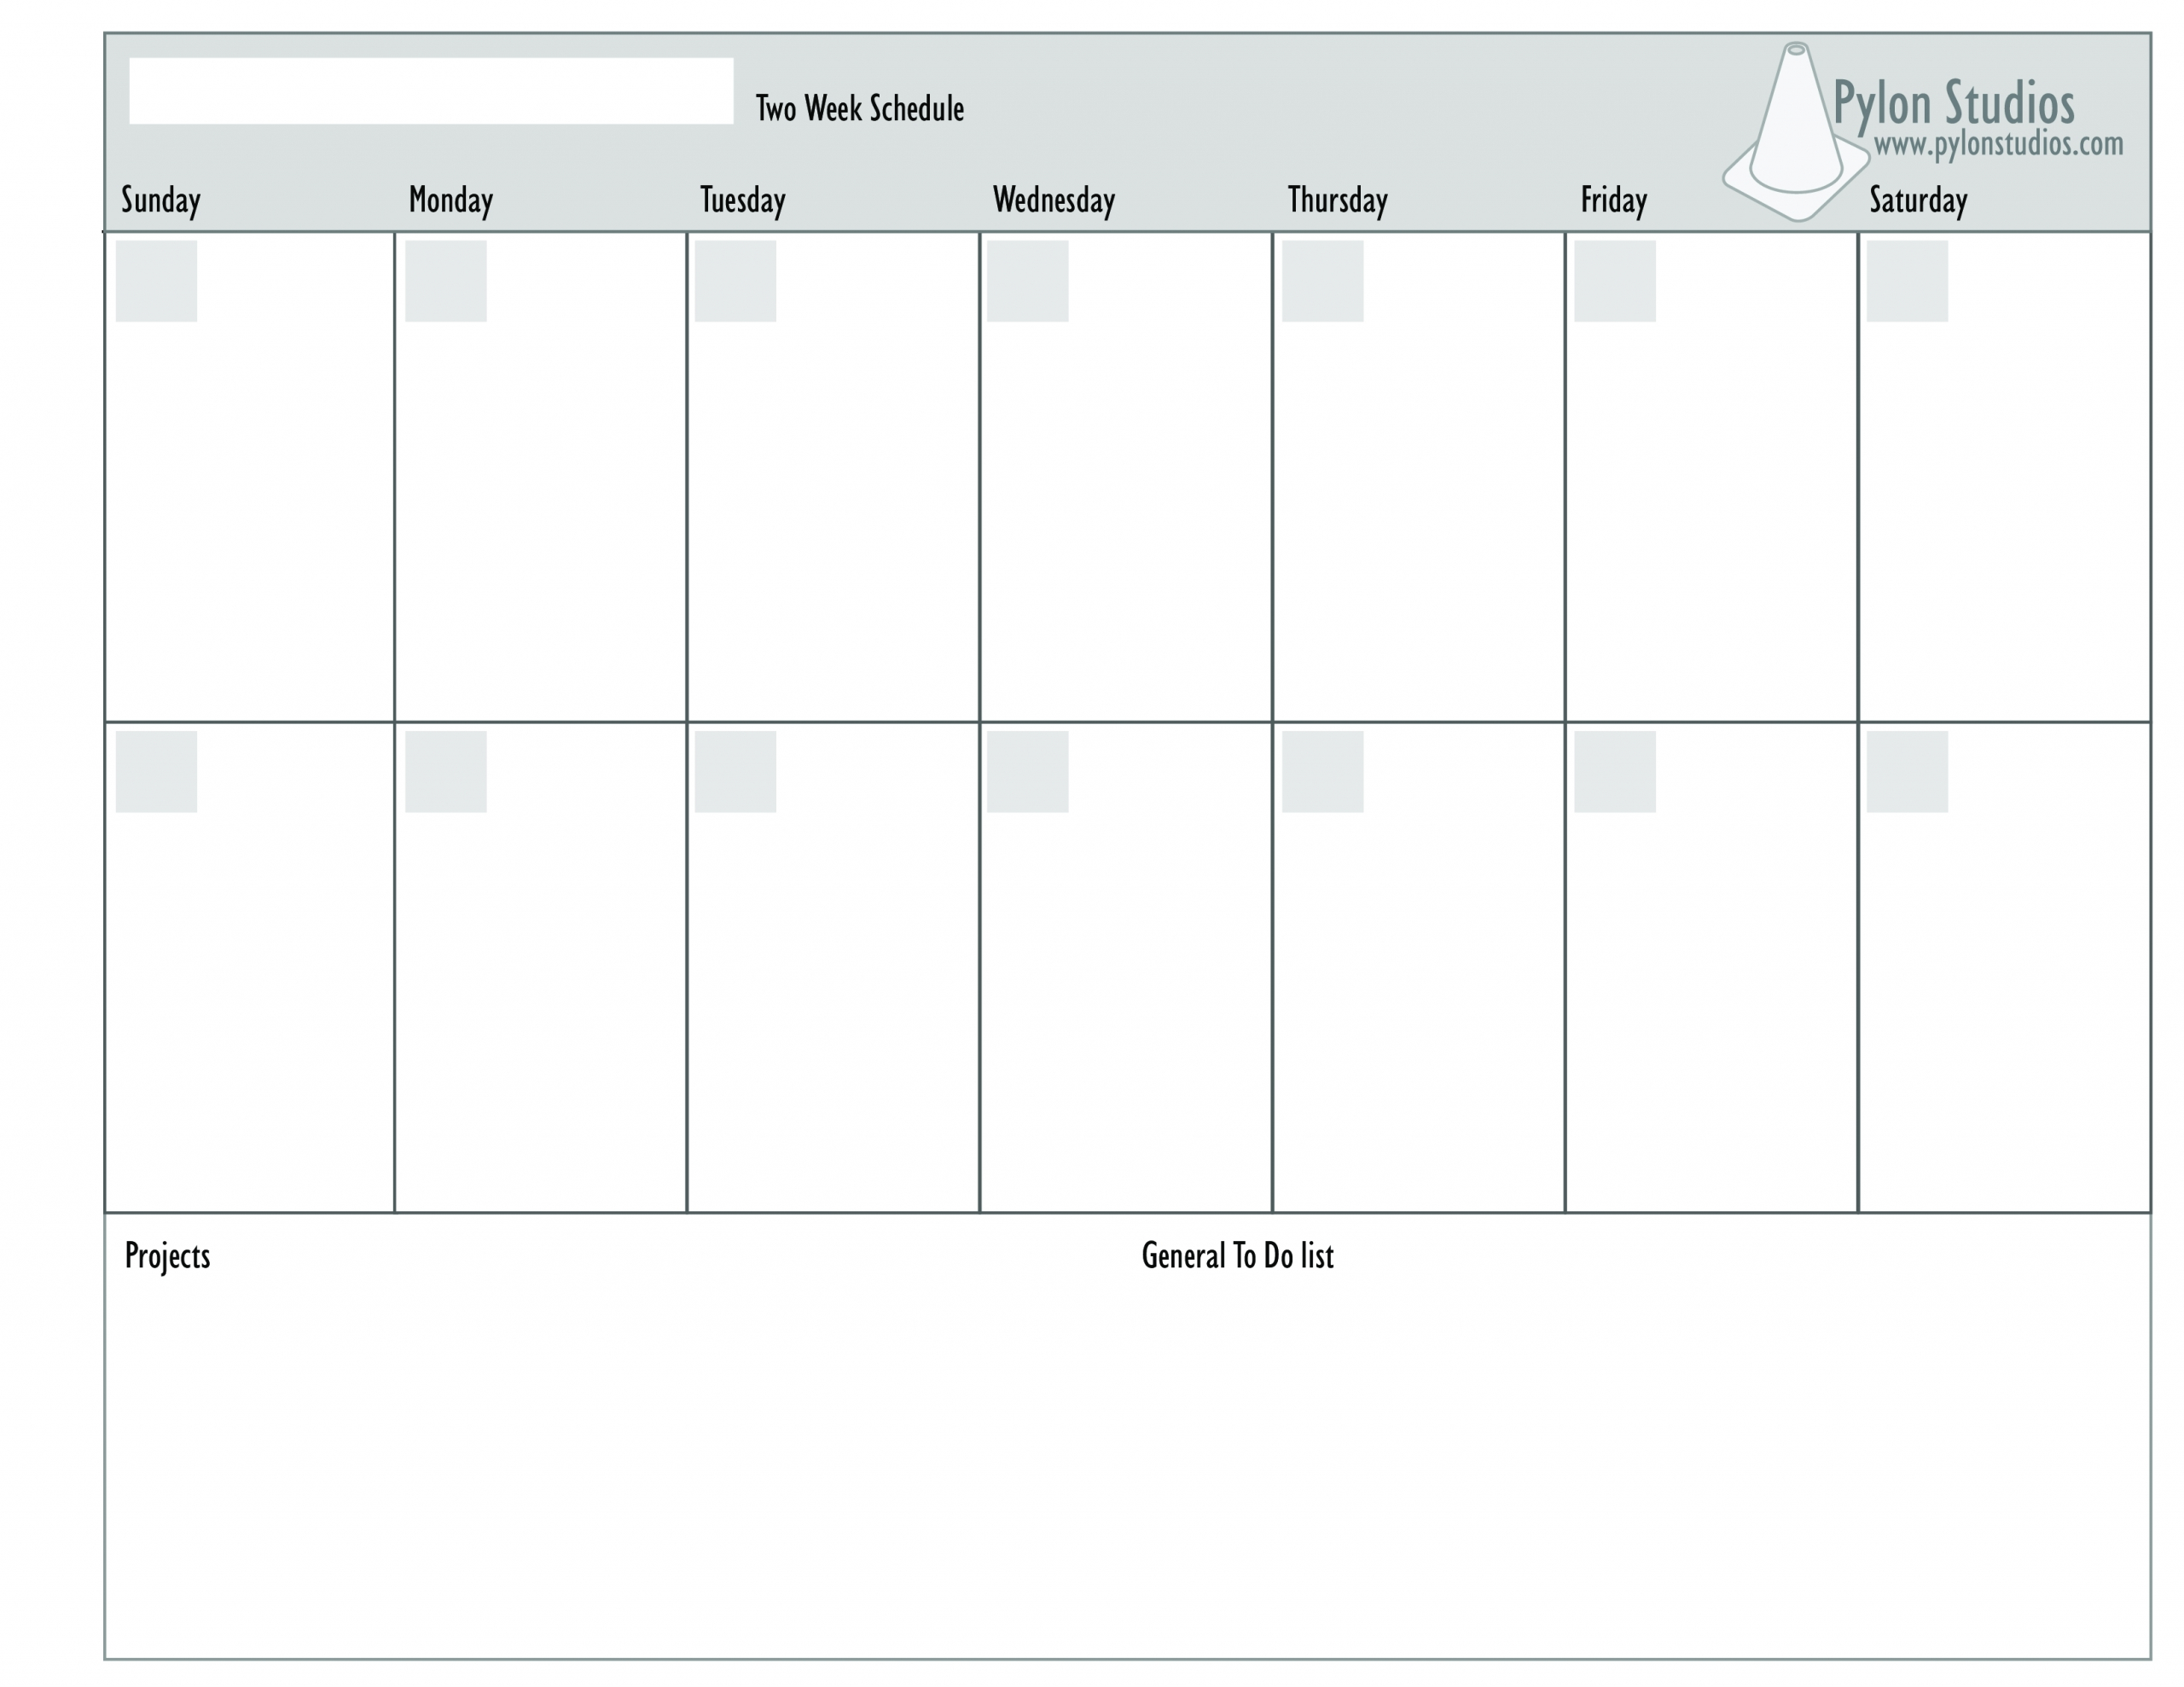 Blank Monday Through Friday Template | Ten Free Printable Mon - Fri Calender Layout Download